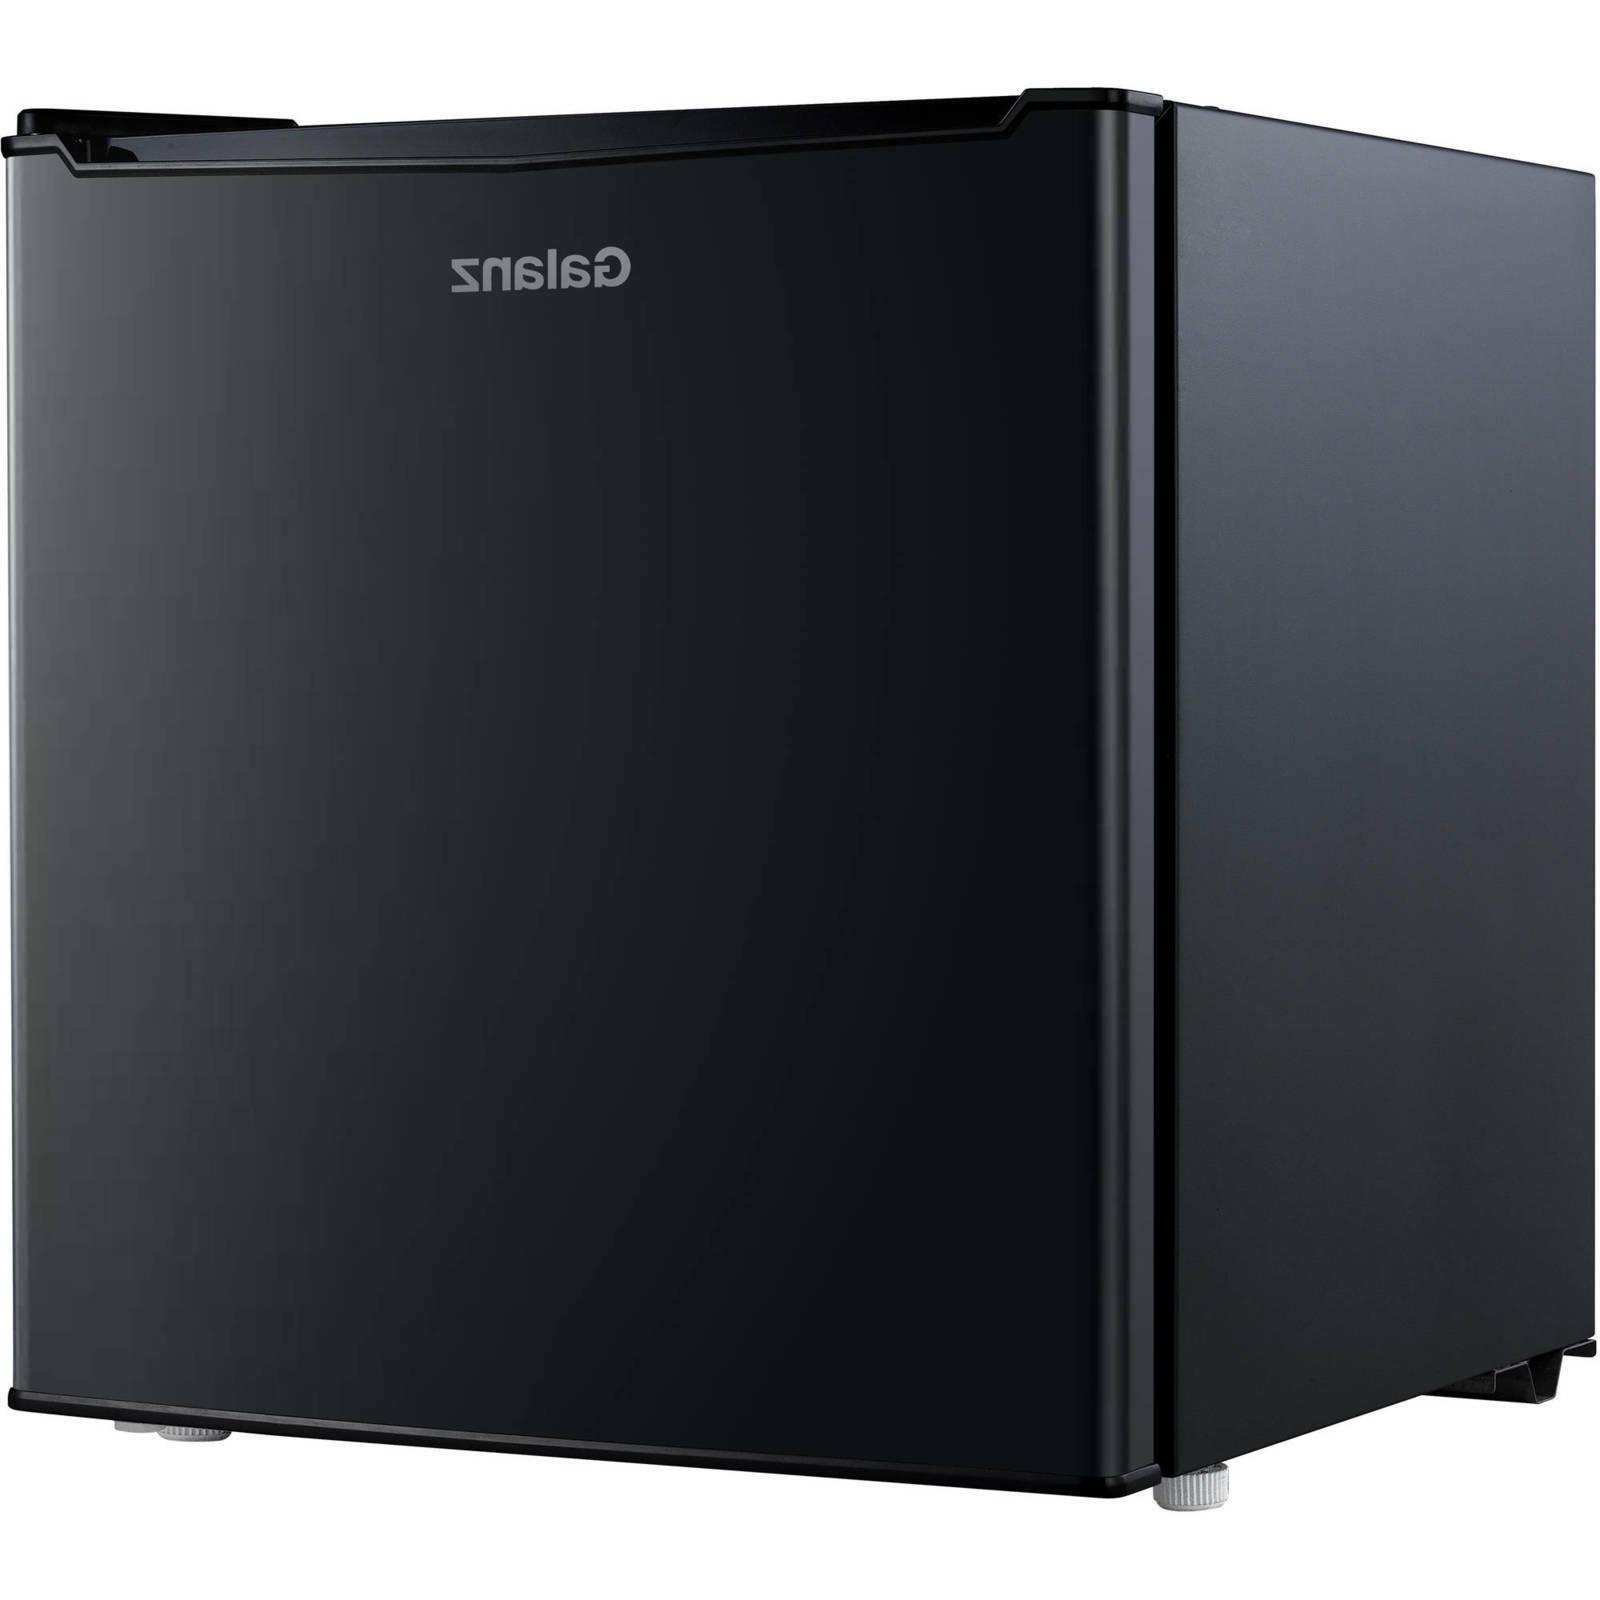 compact mini fridge refrigerator 1 7 cu